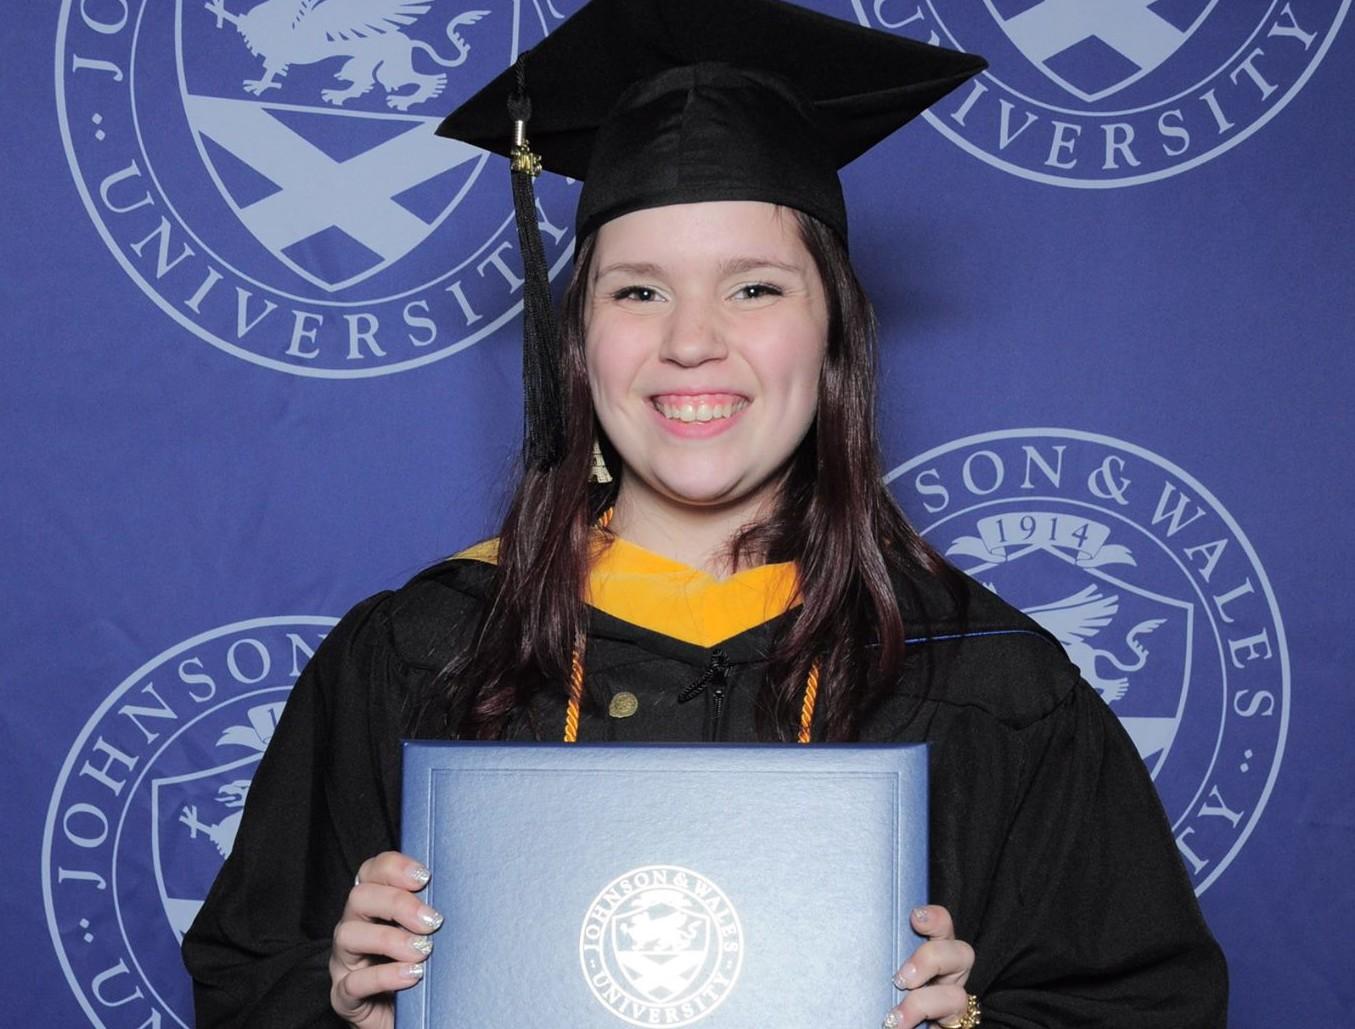 Kinsey Fredericks-Bishow, 21